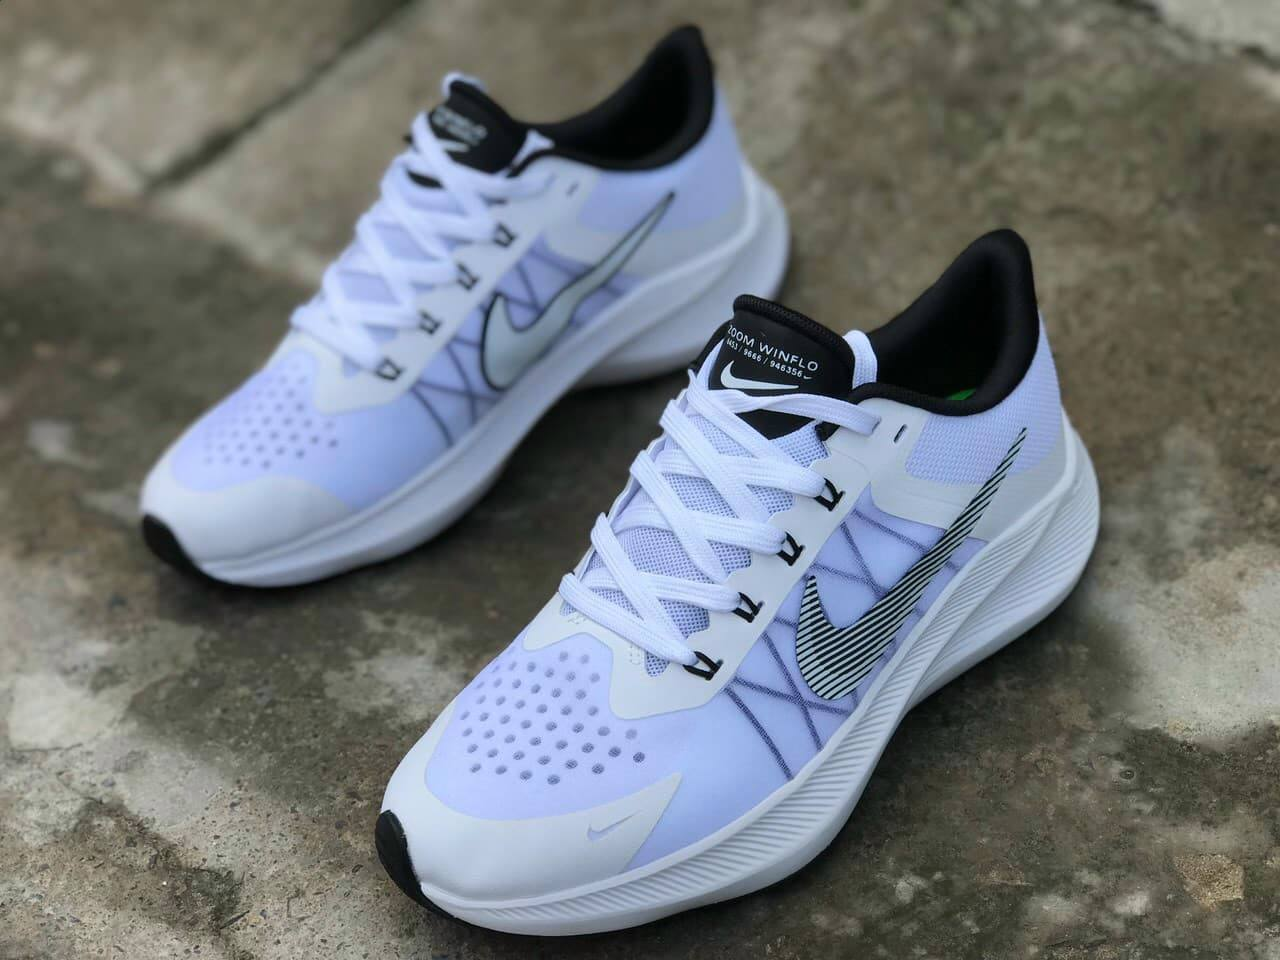 Nike Zoom Winflo 8 White